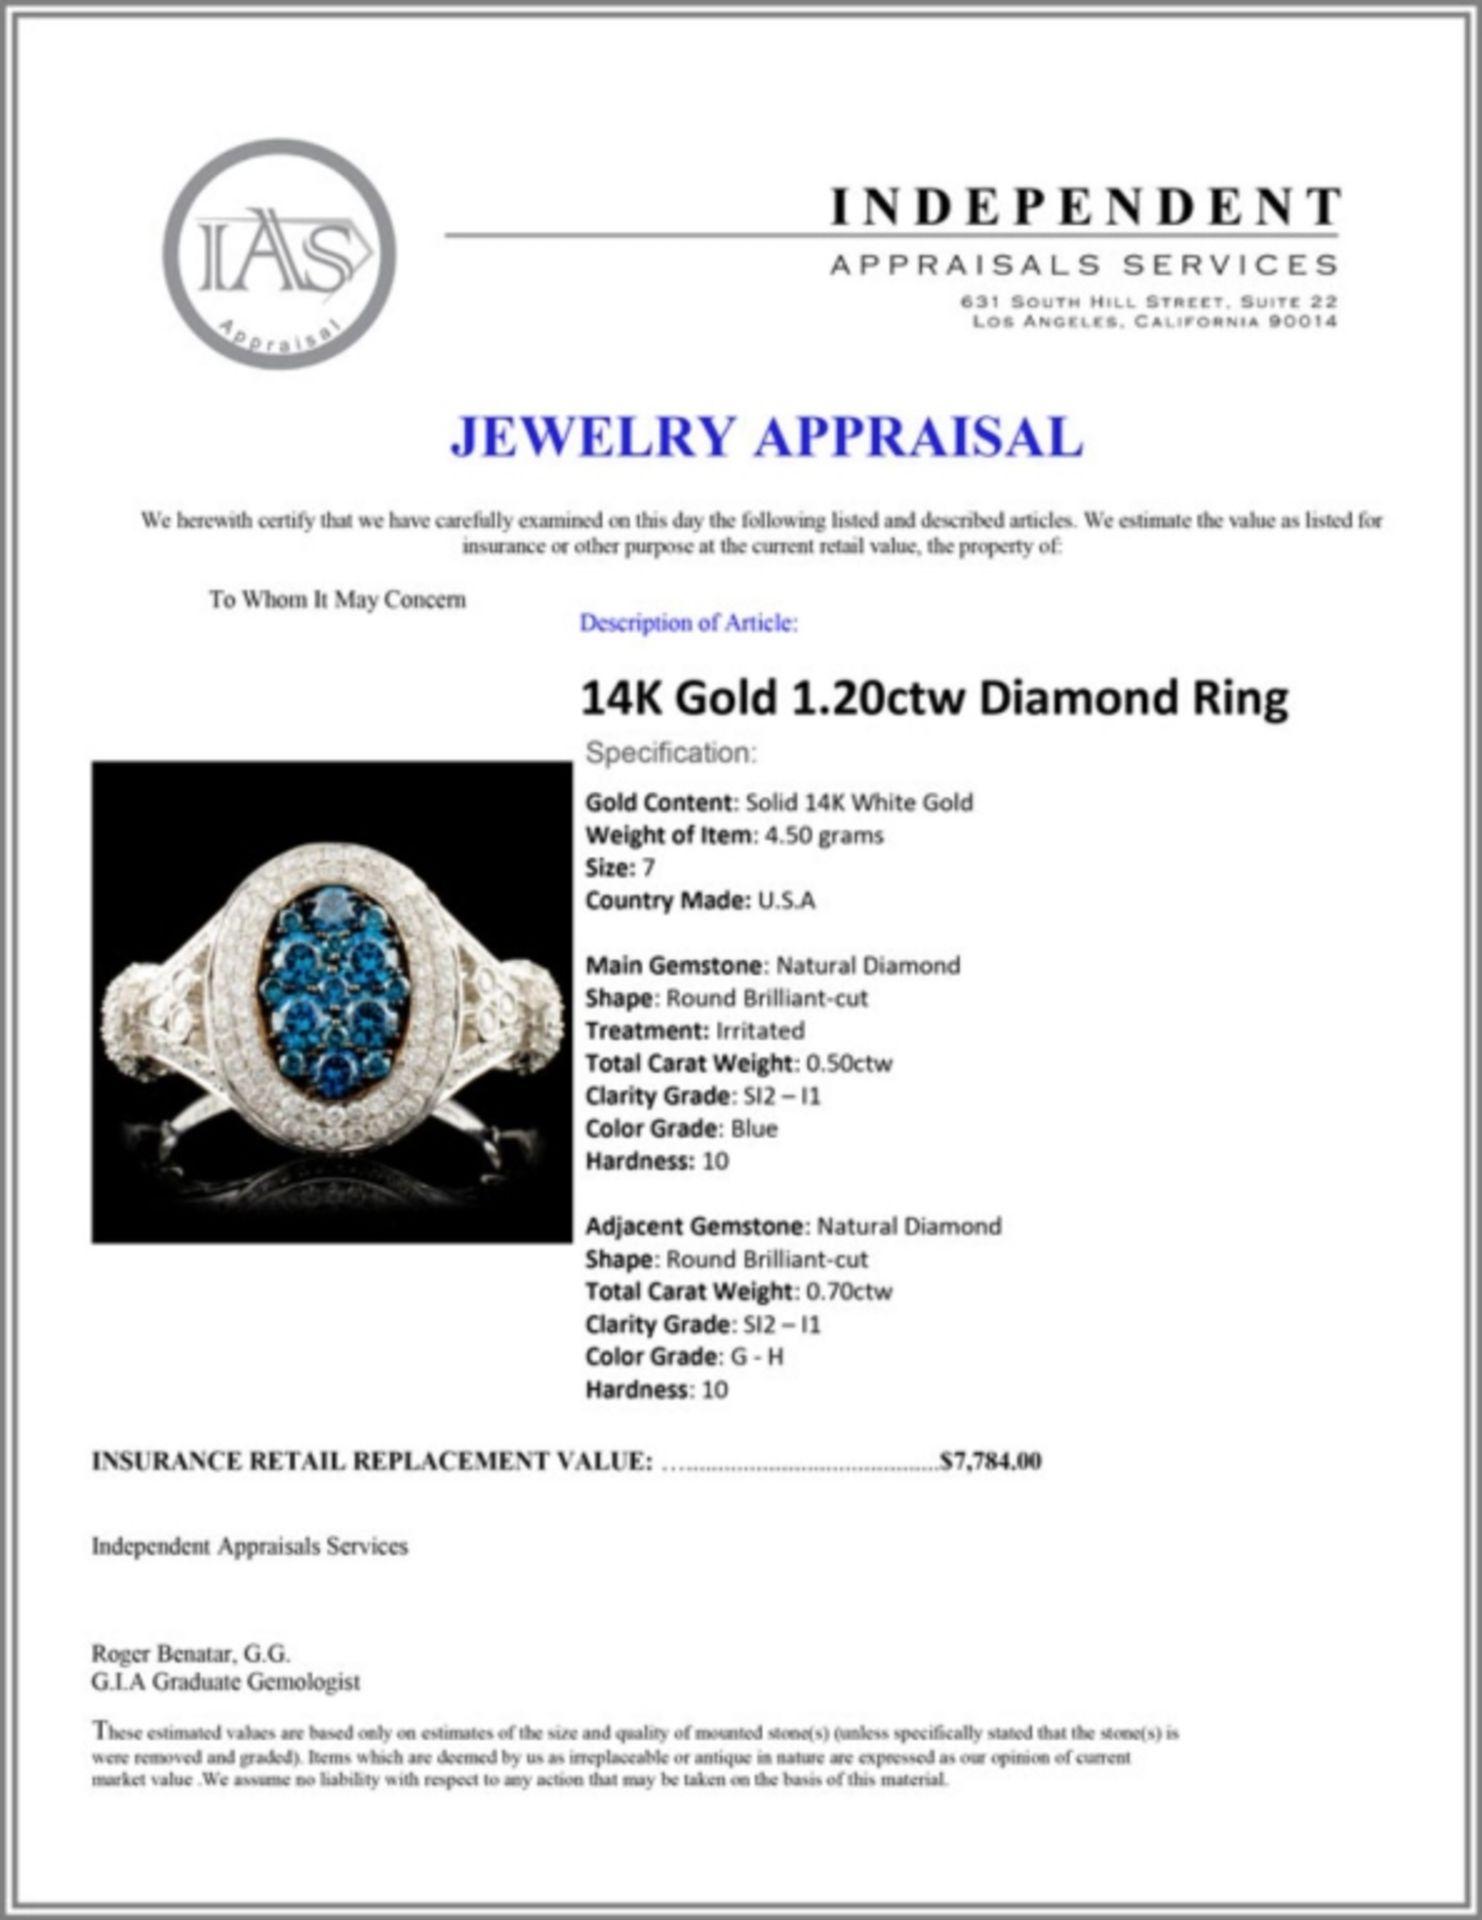 14K Gold 1.20ctw Diamond Ring - Image 5 of 5